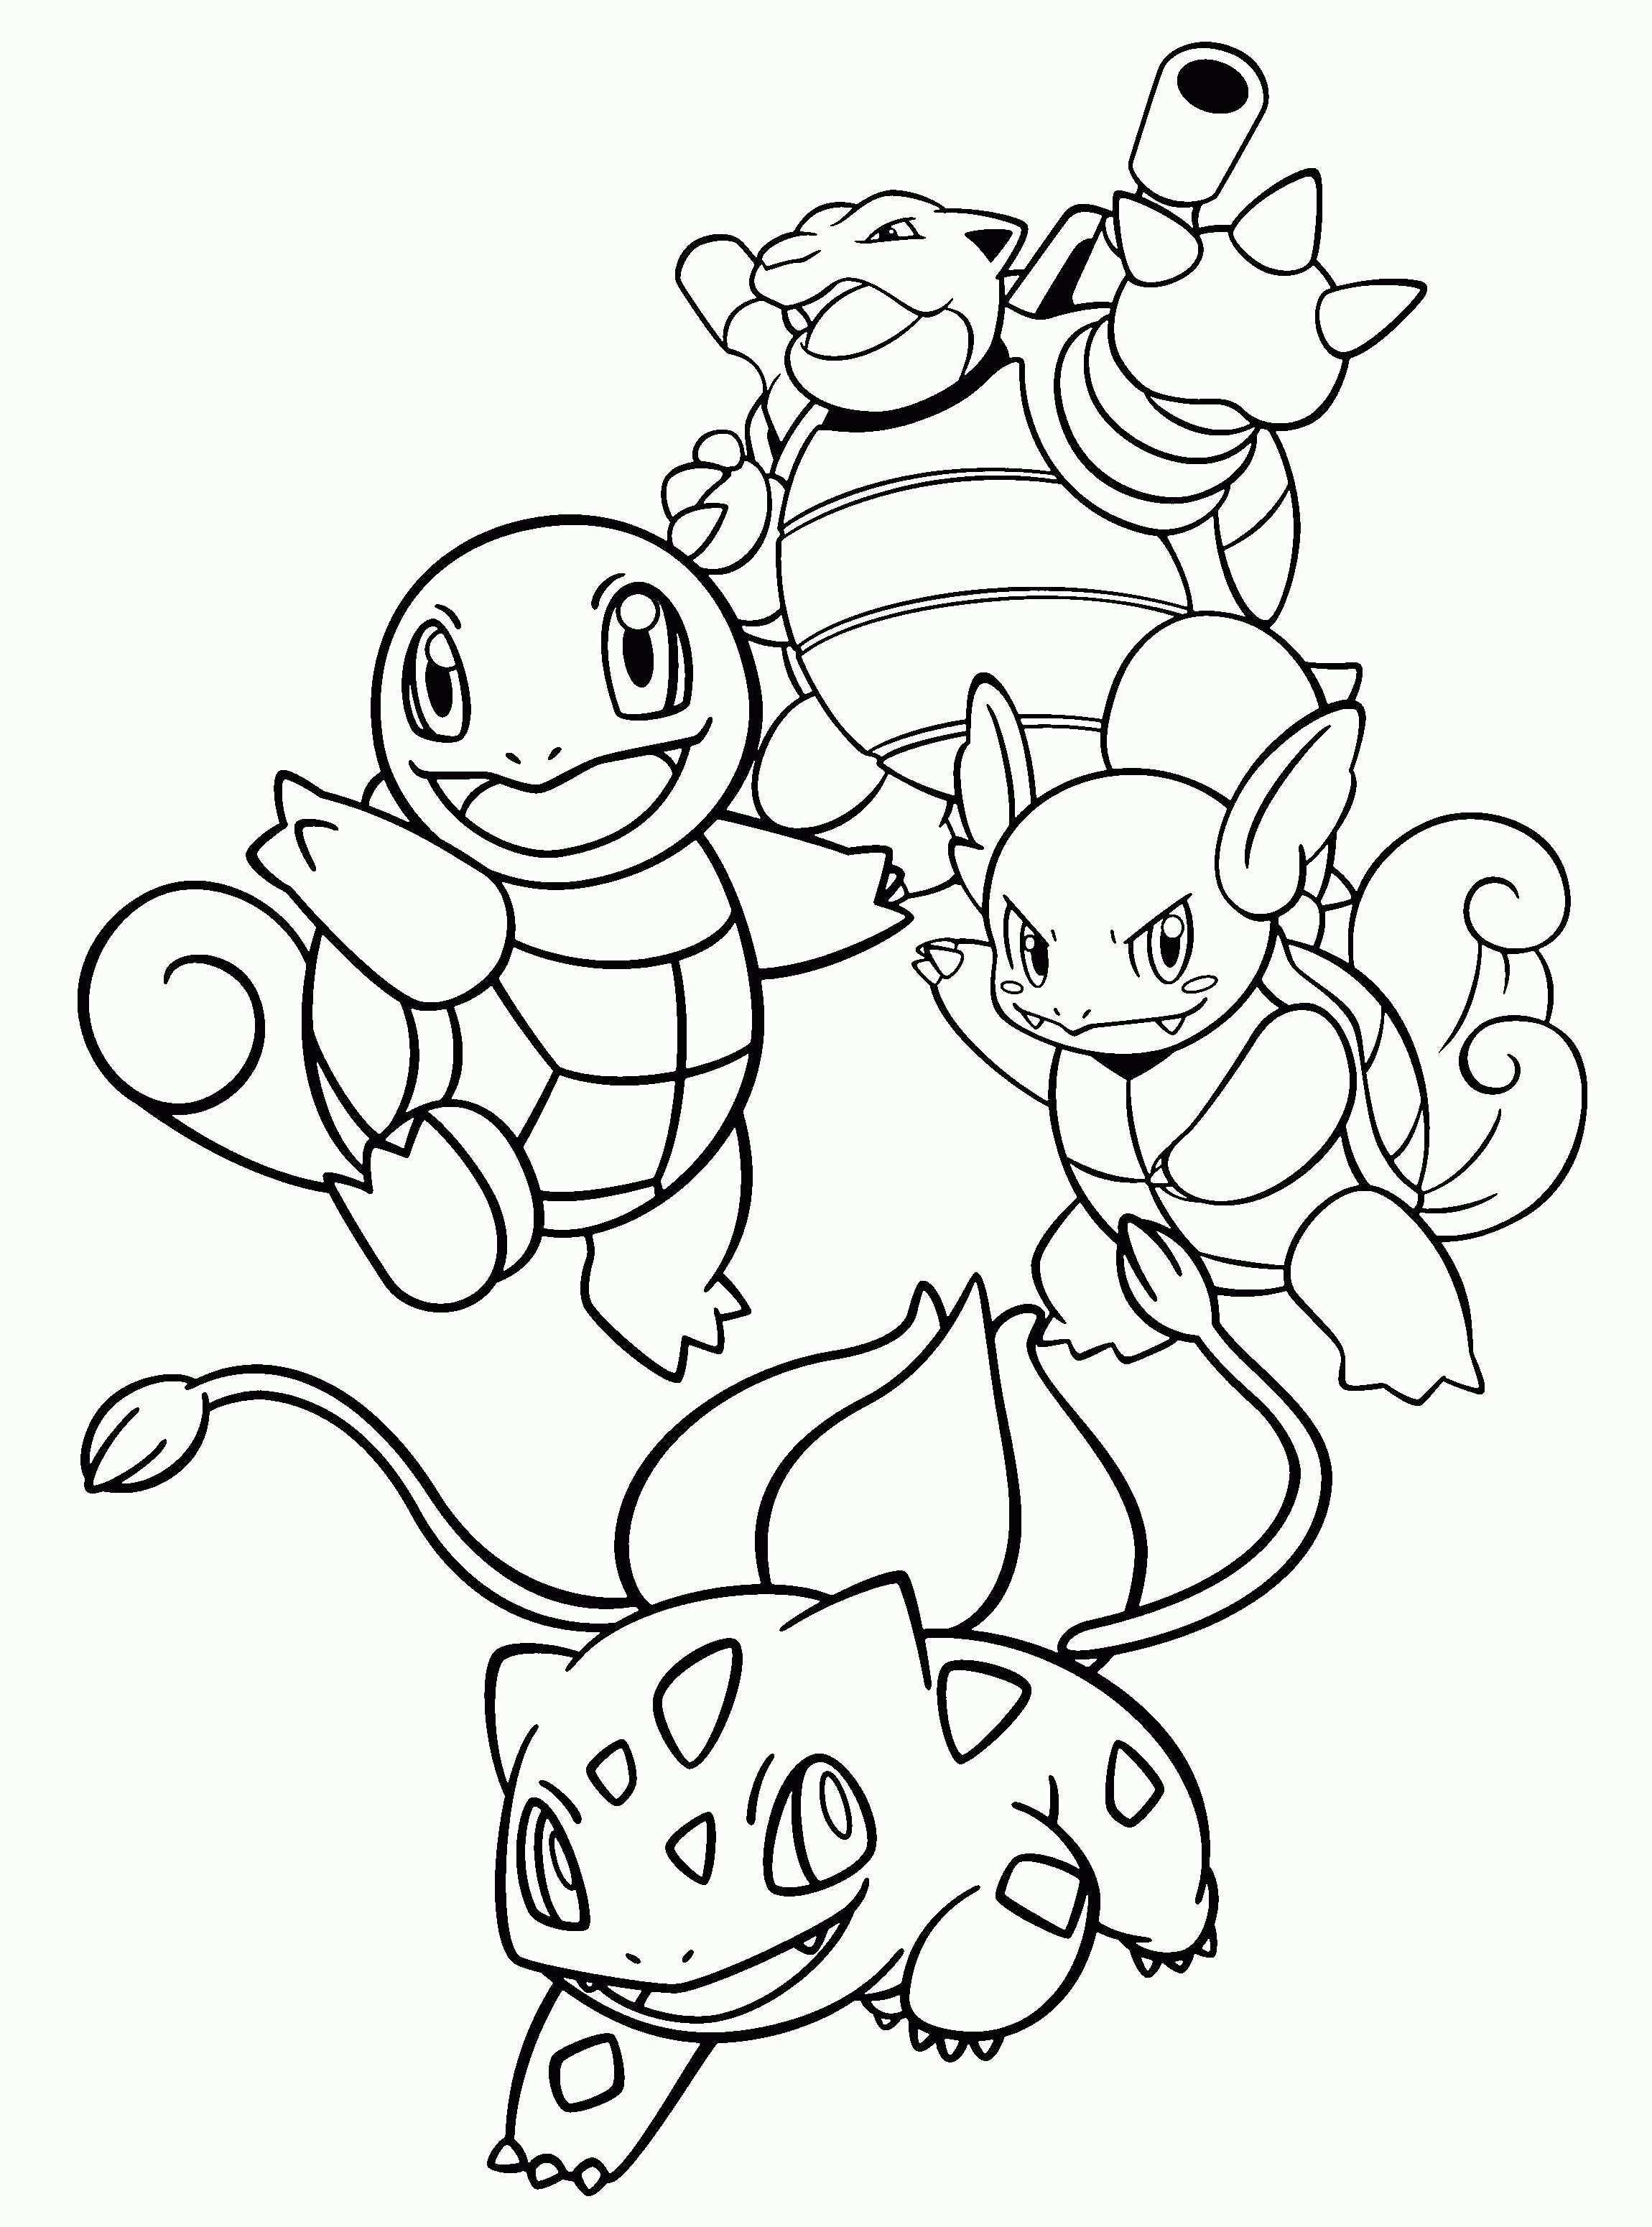 Coloring Pages With Squirtle Page Napisy Kleurplaat Pokemon Kleurplaten Pokemon Afbeeldingen Pokemon